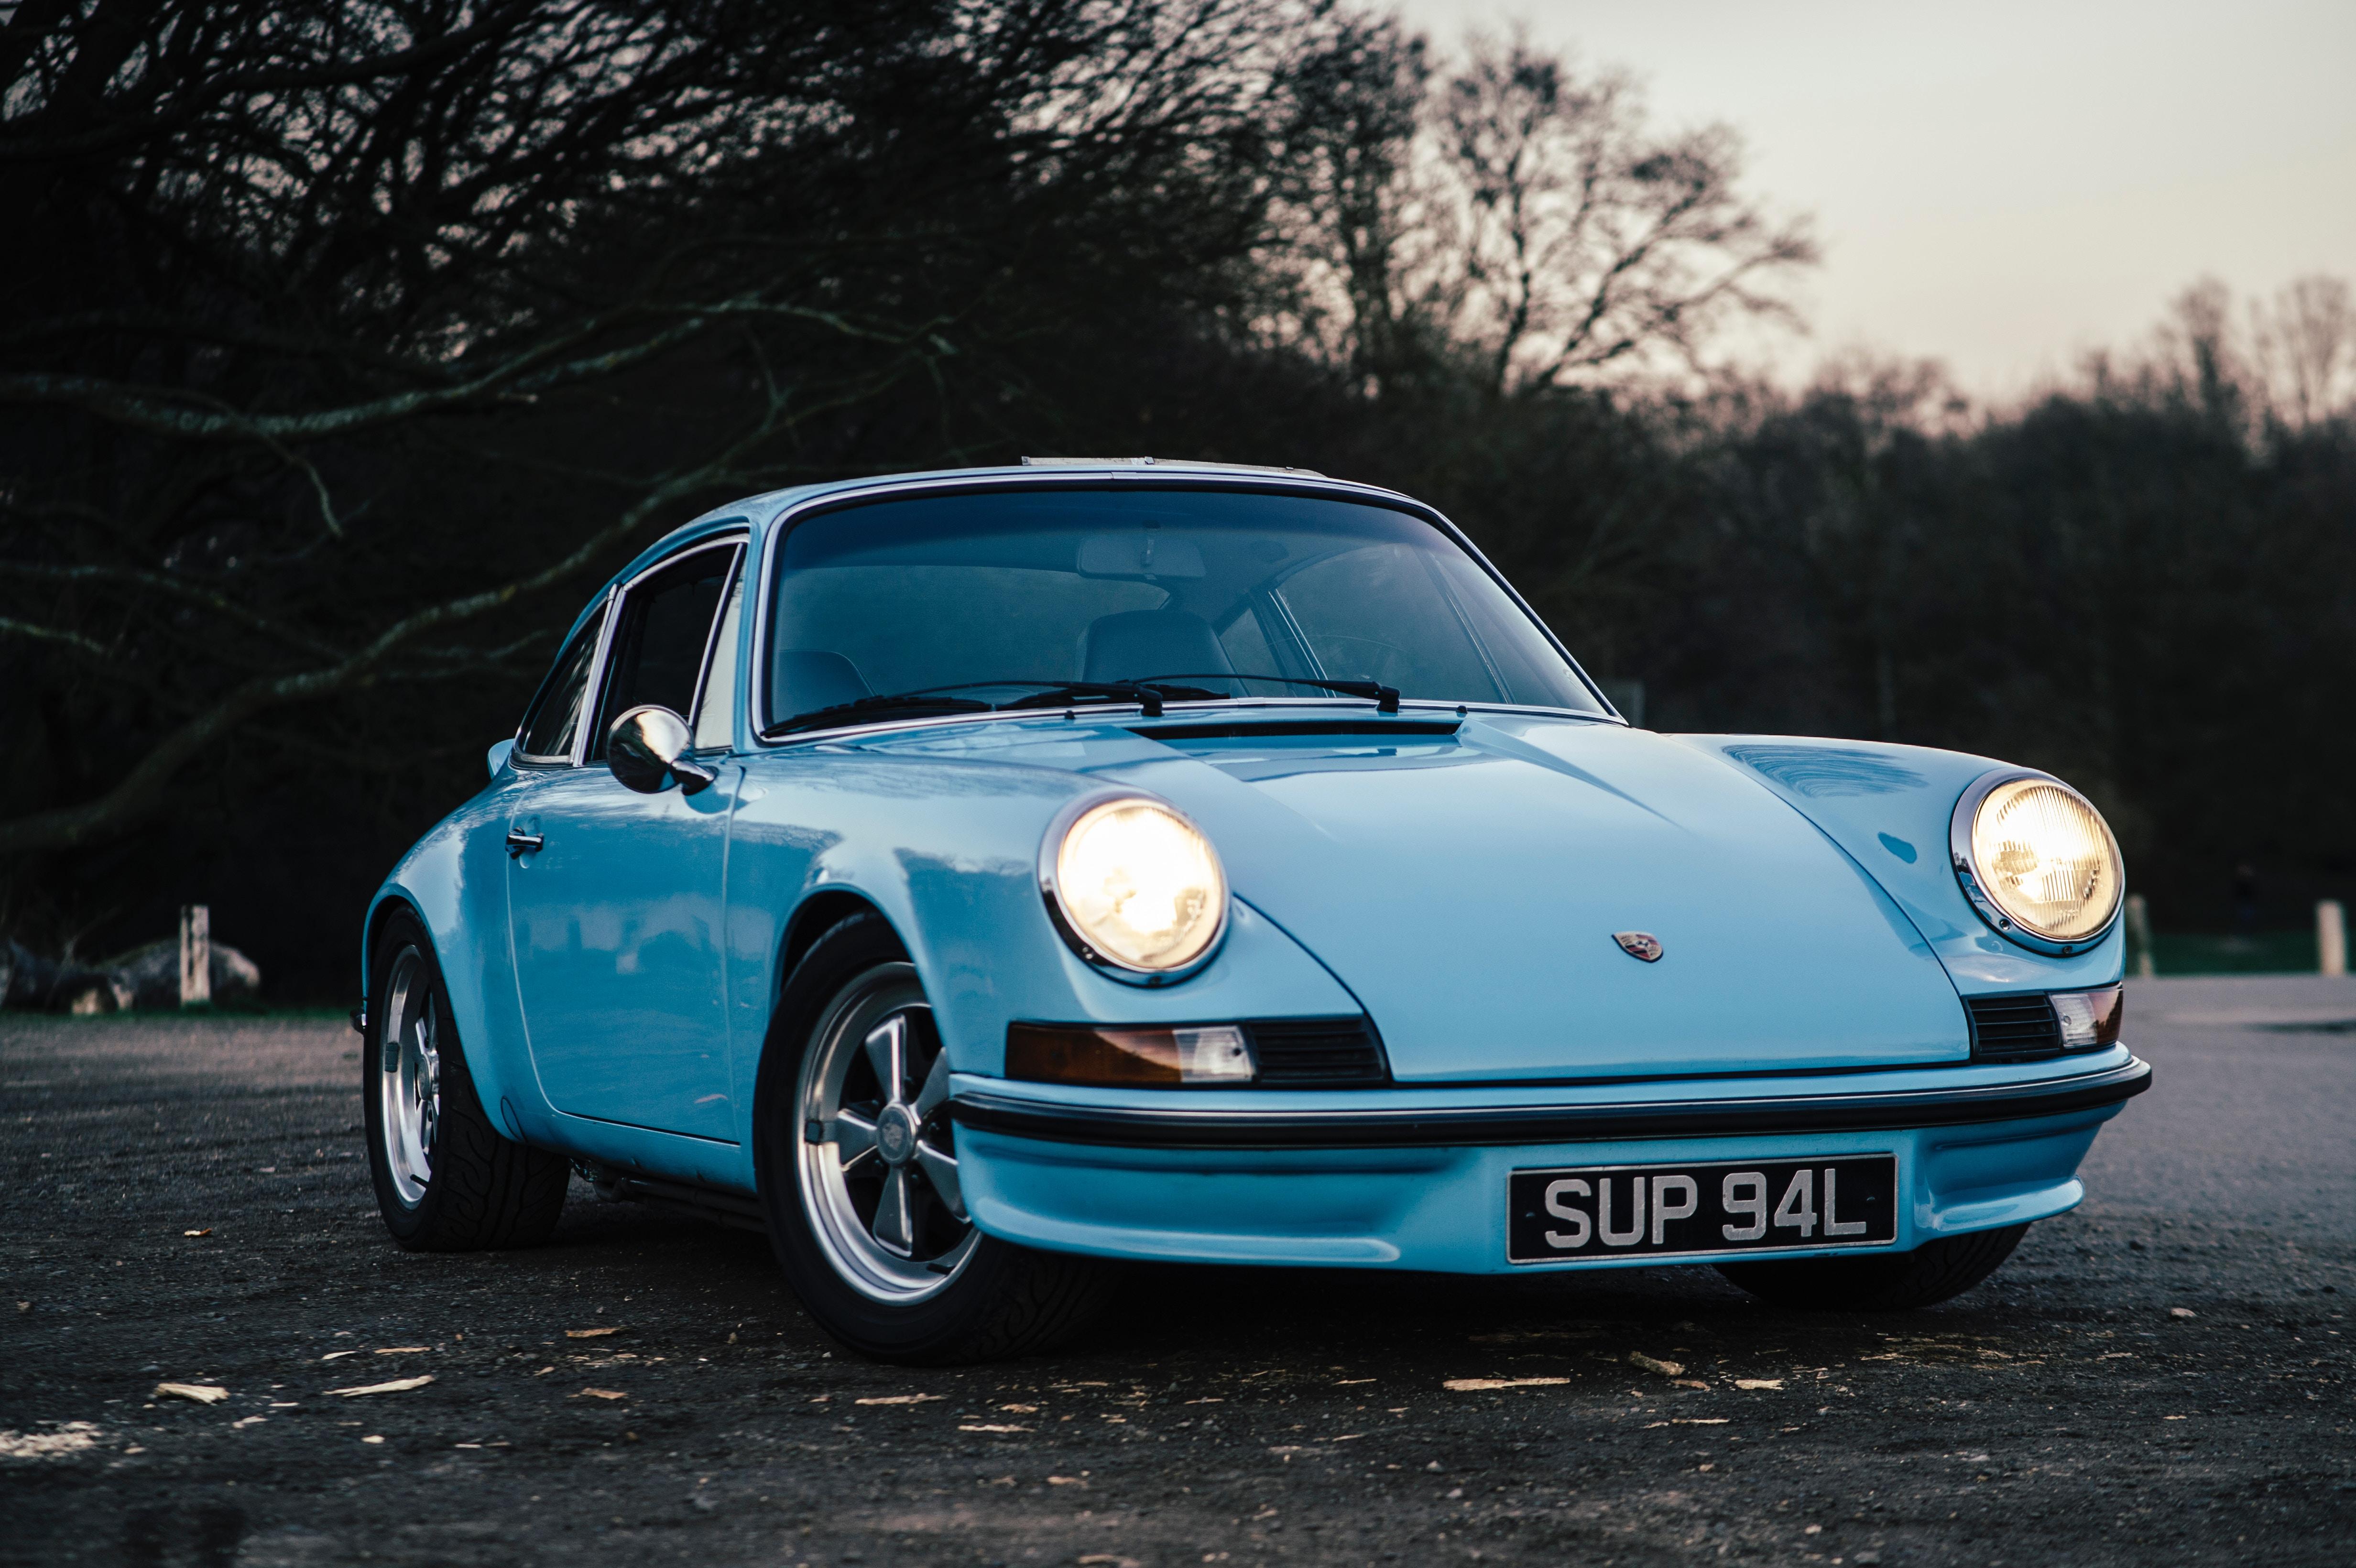 Porsche Vintage Car 5k Hd Cars 4k Wallpapers Images Backgrounds